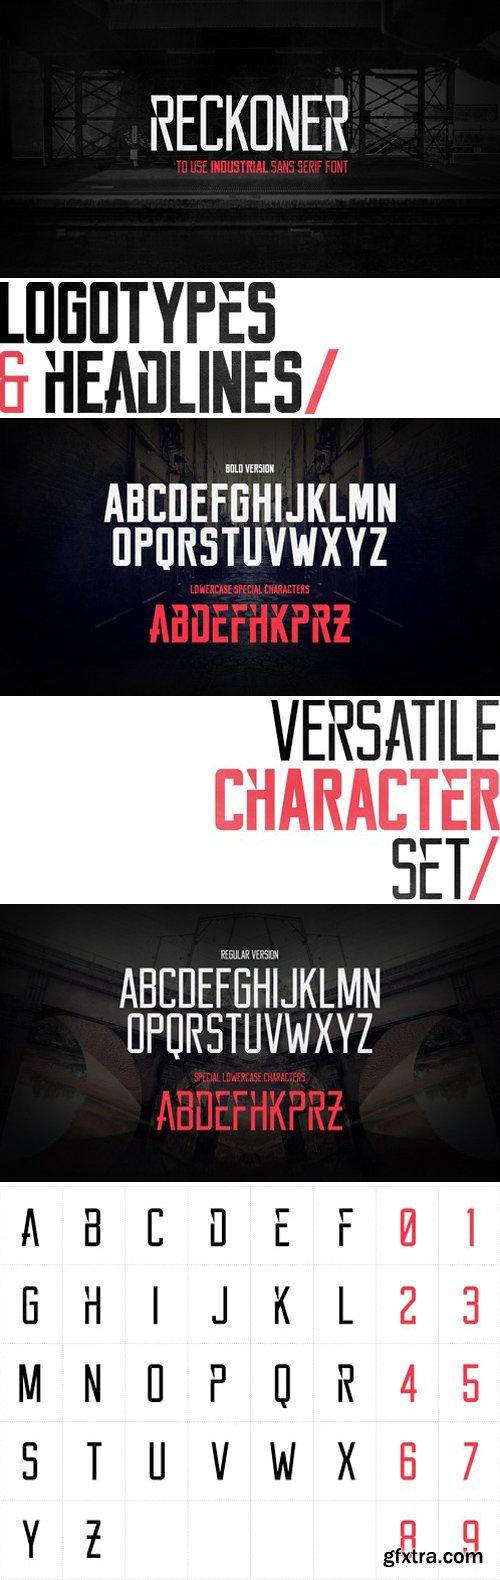 Reckoner Typeface